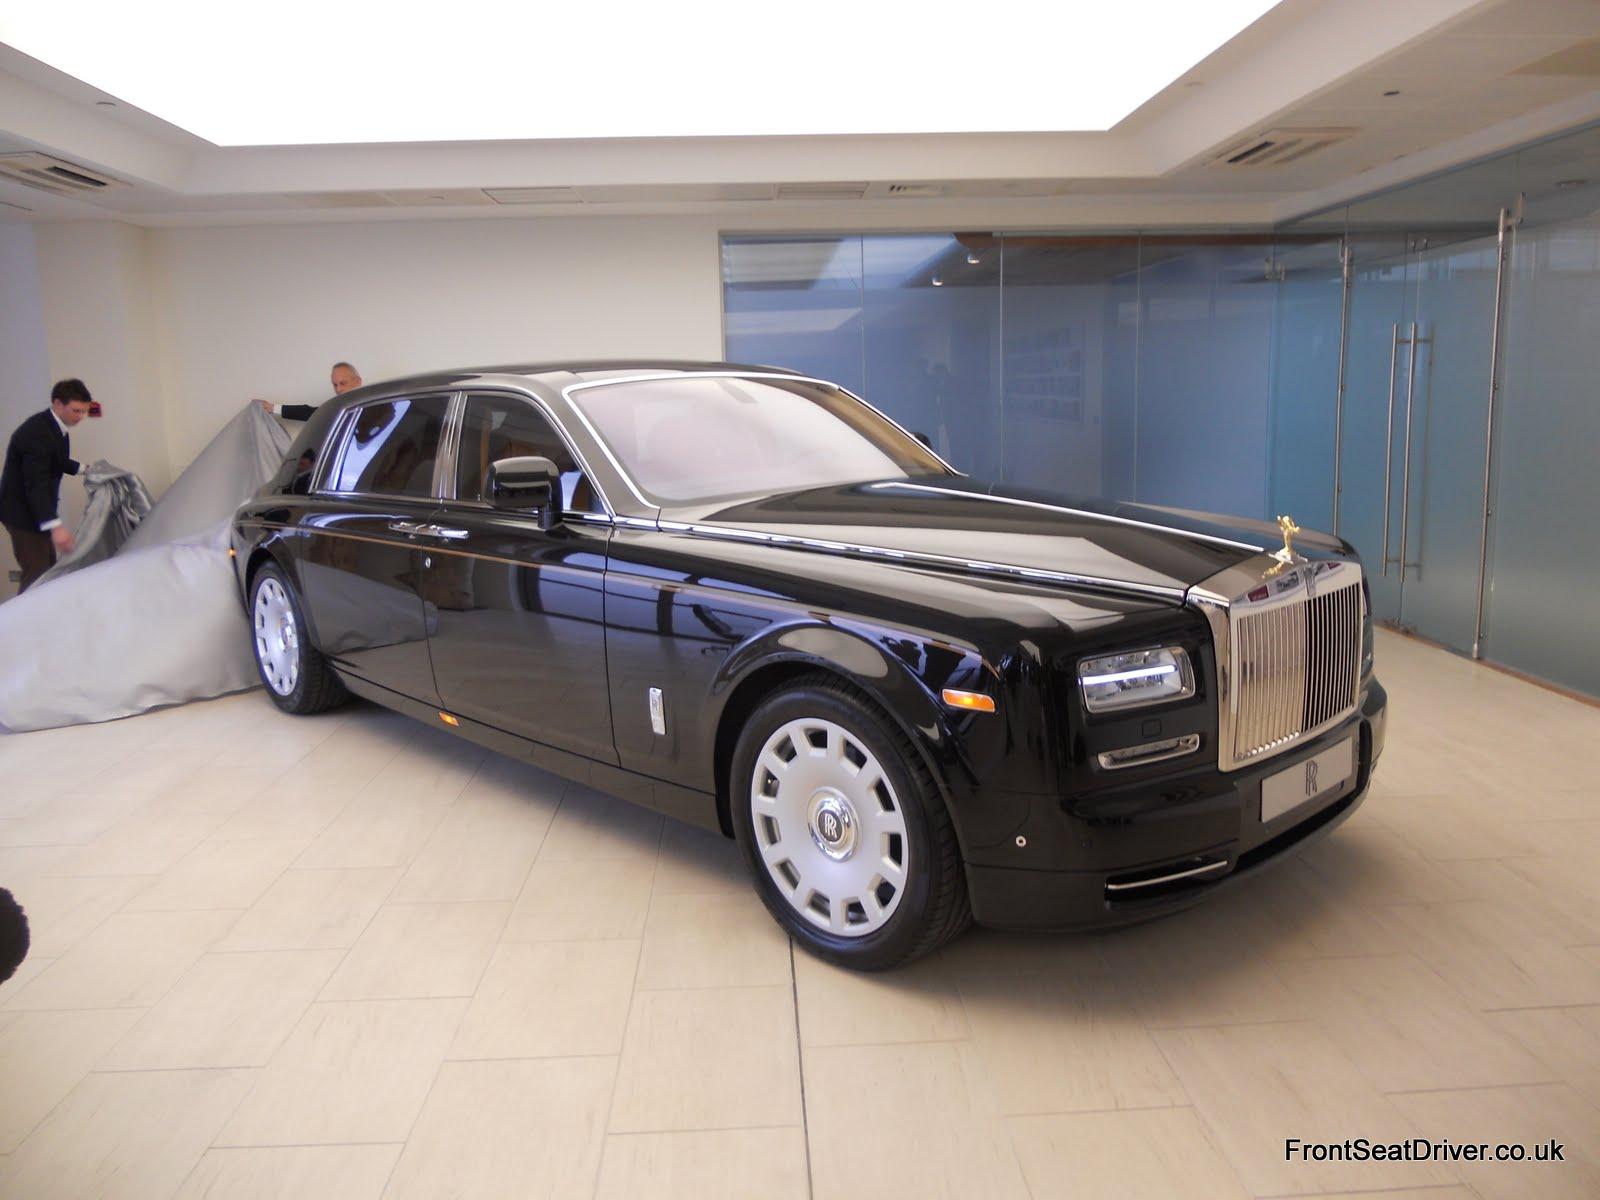 Rolls Royce Phantom Series 2 2012 Revealed Front Seat Driver